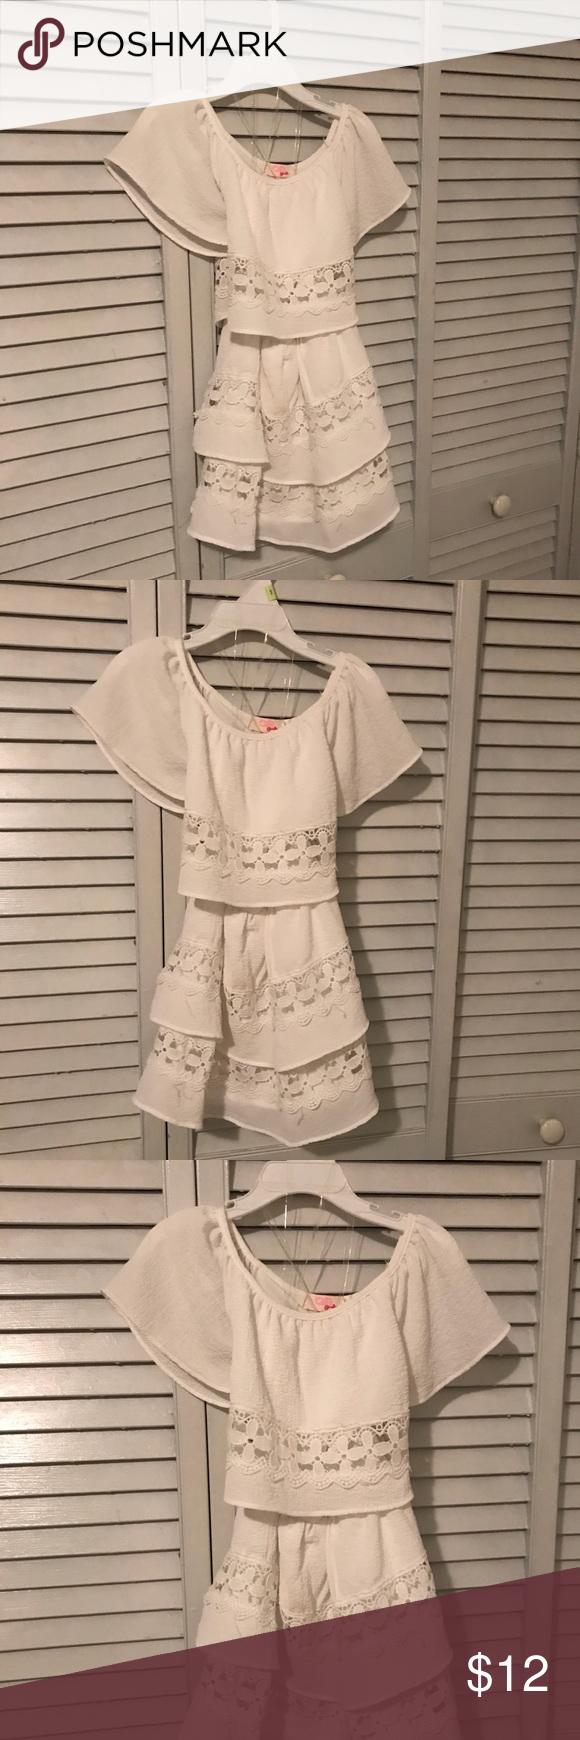 d4f60baad81 GB girls (Gianni Bini) dress Like new!!! Gianni Bini Dresses Casual ...